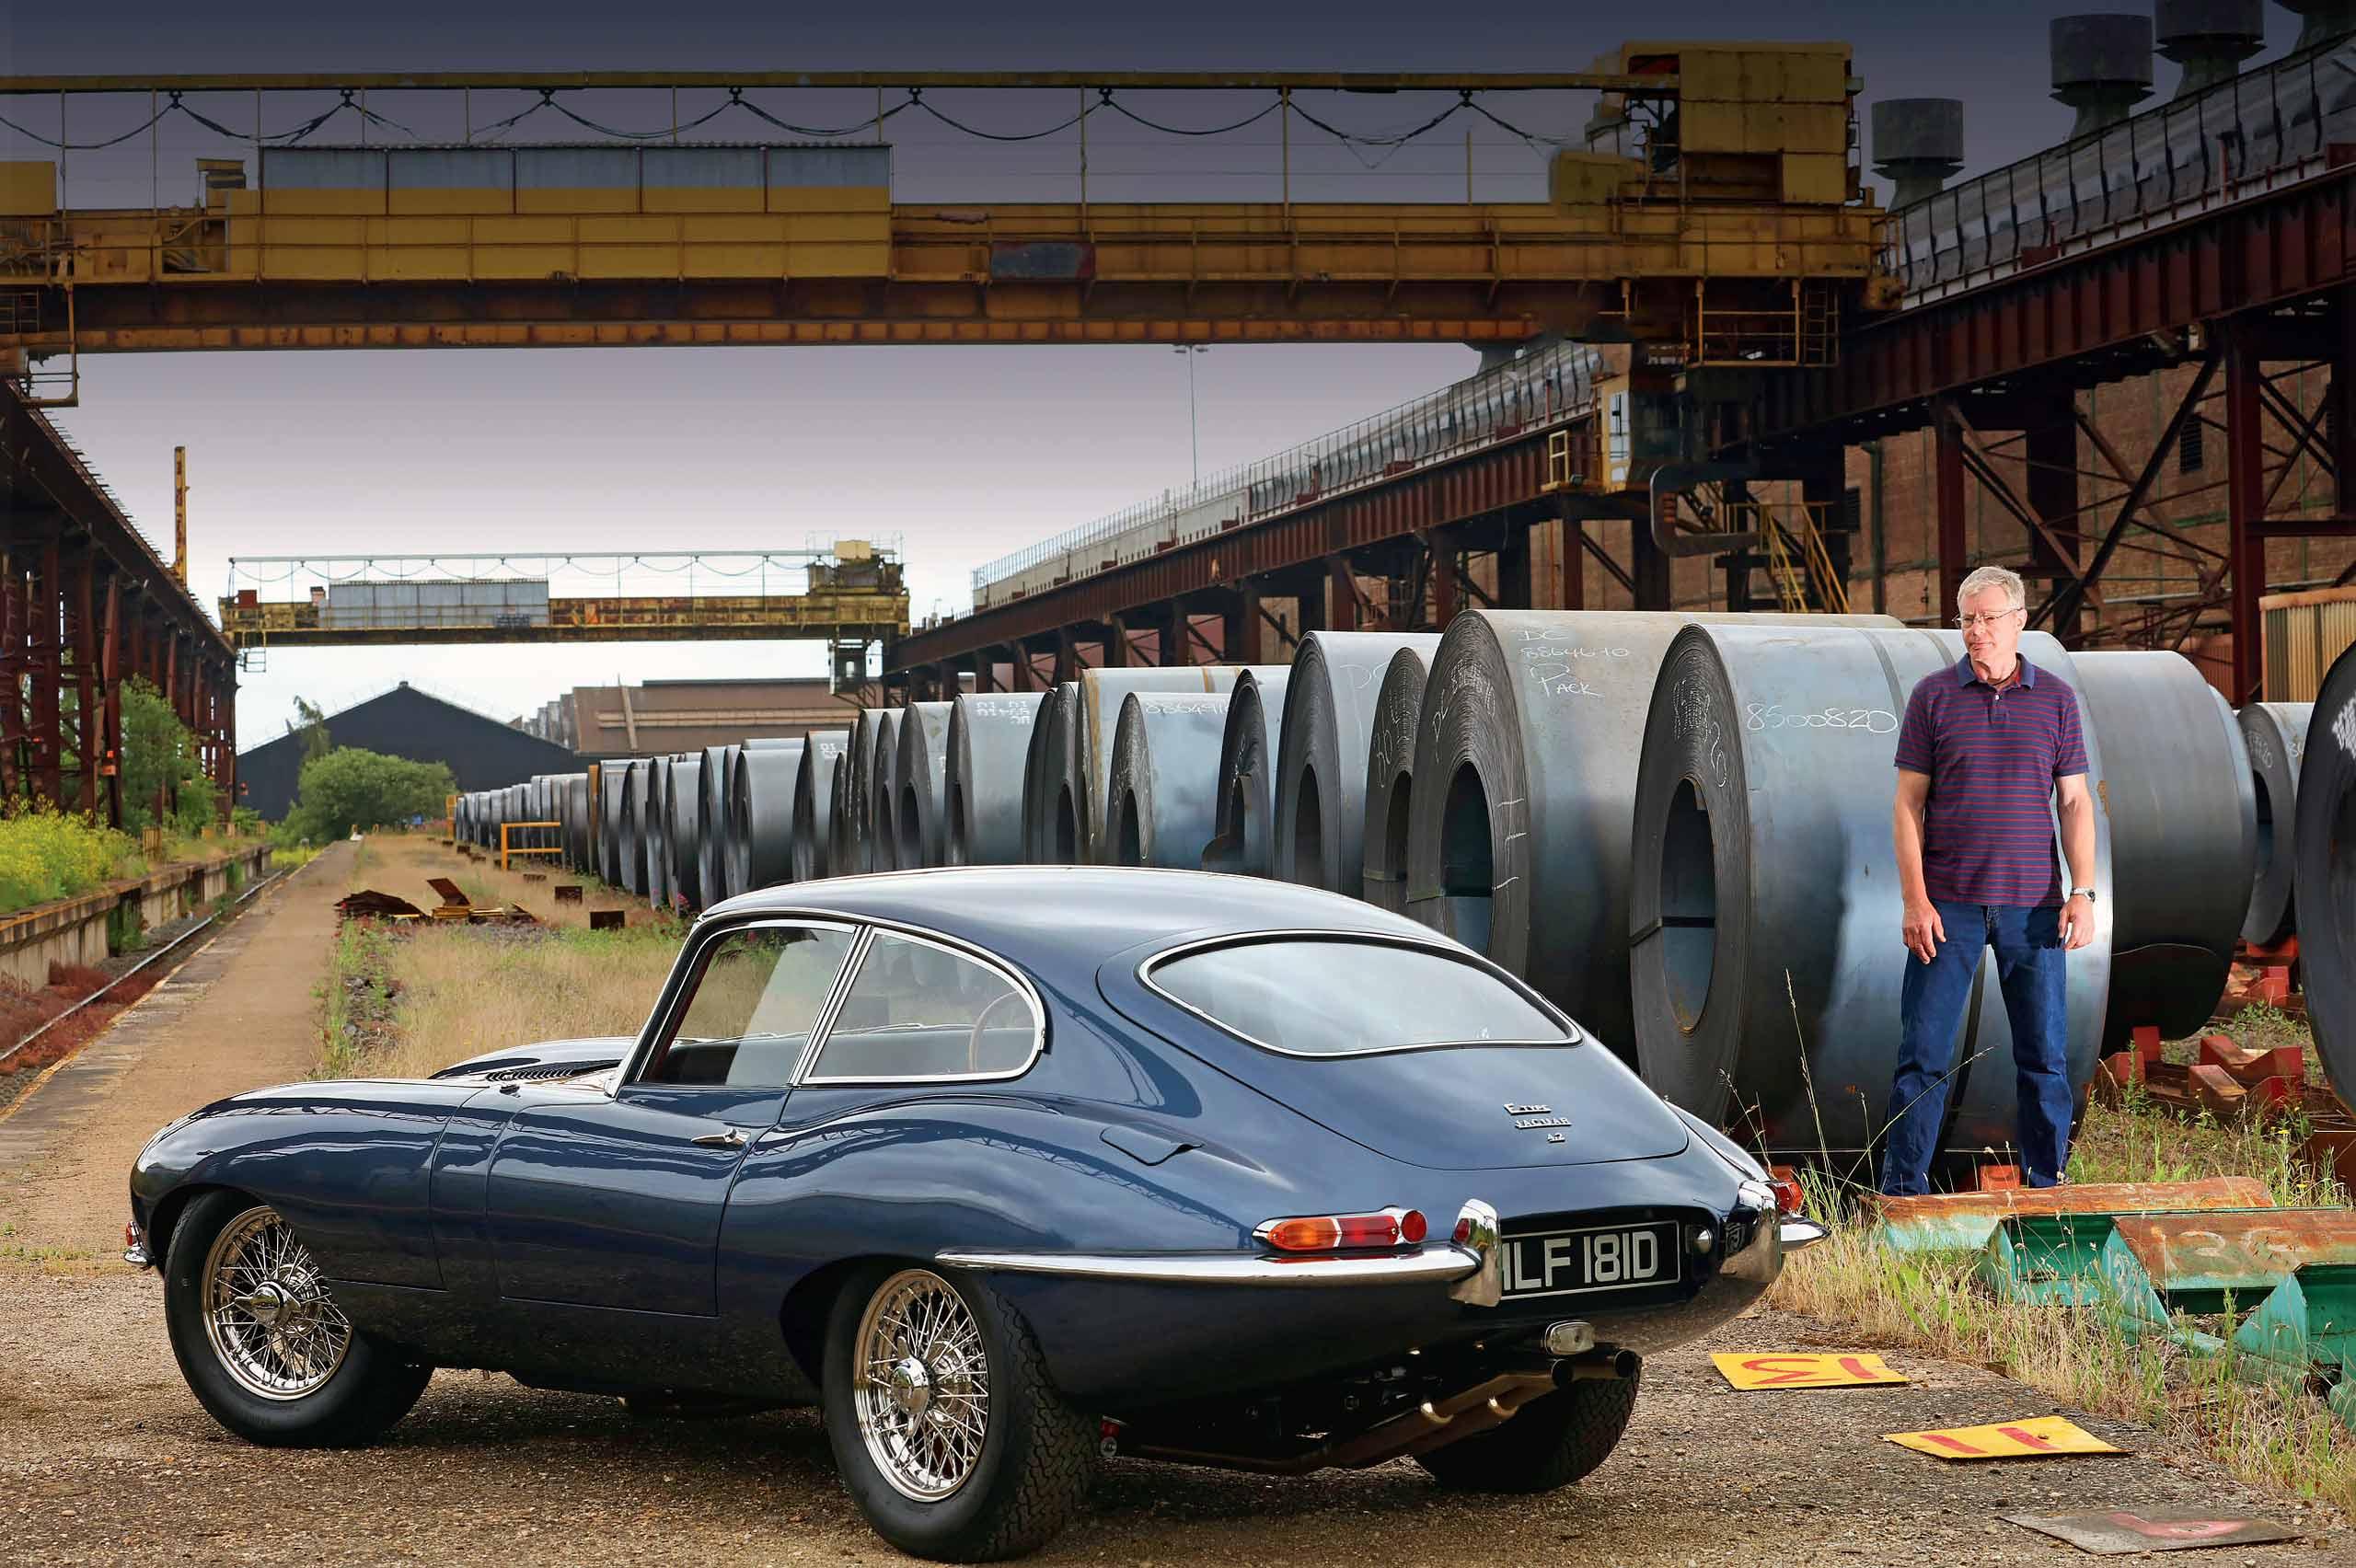 Epic Jaguar E-type restored